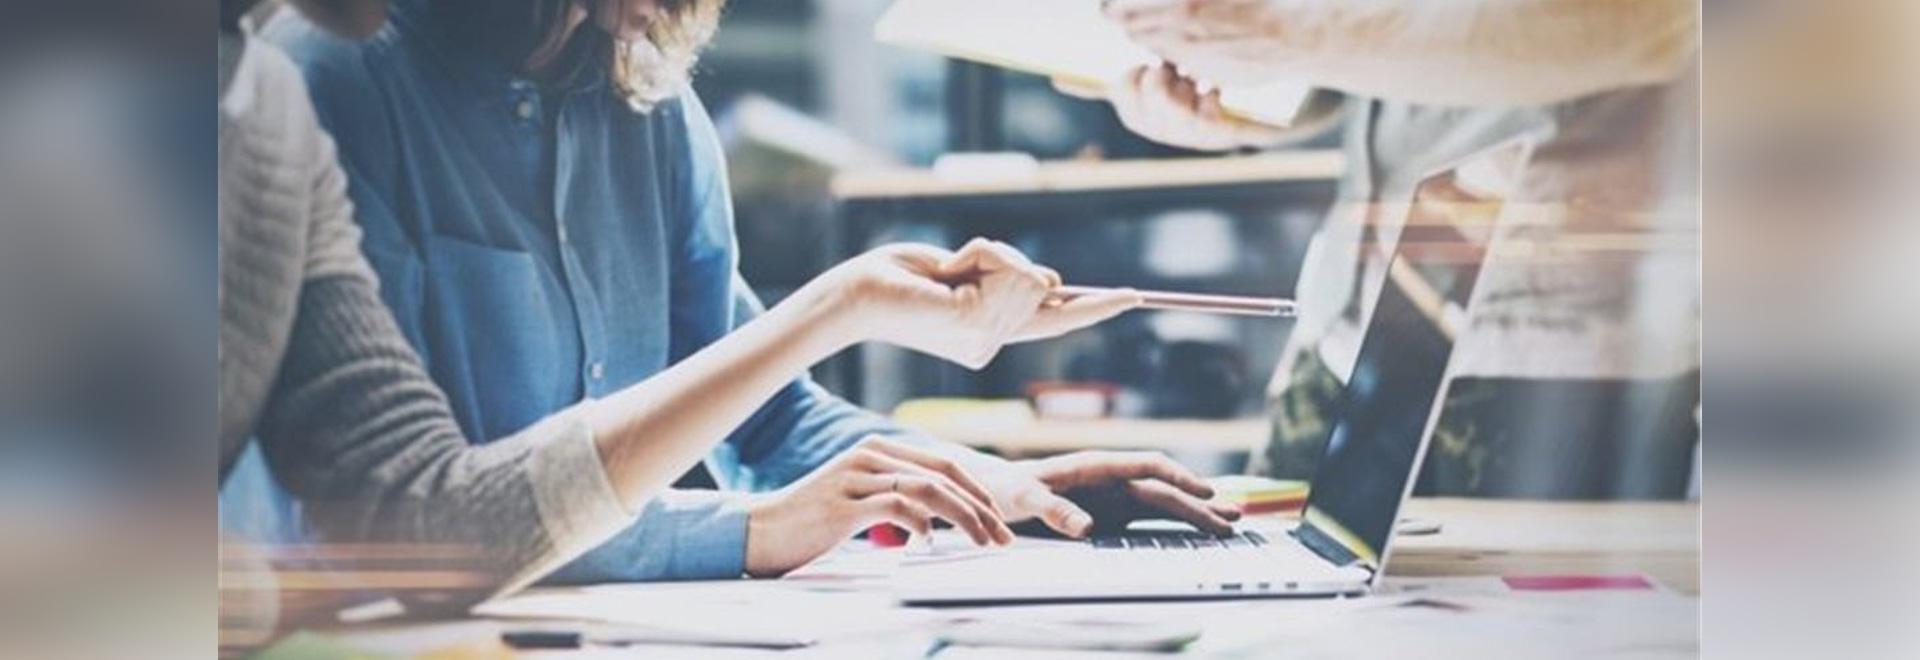 IDS 2017: Last-minute marketing opportunities